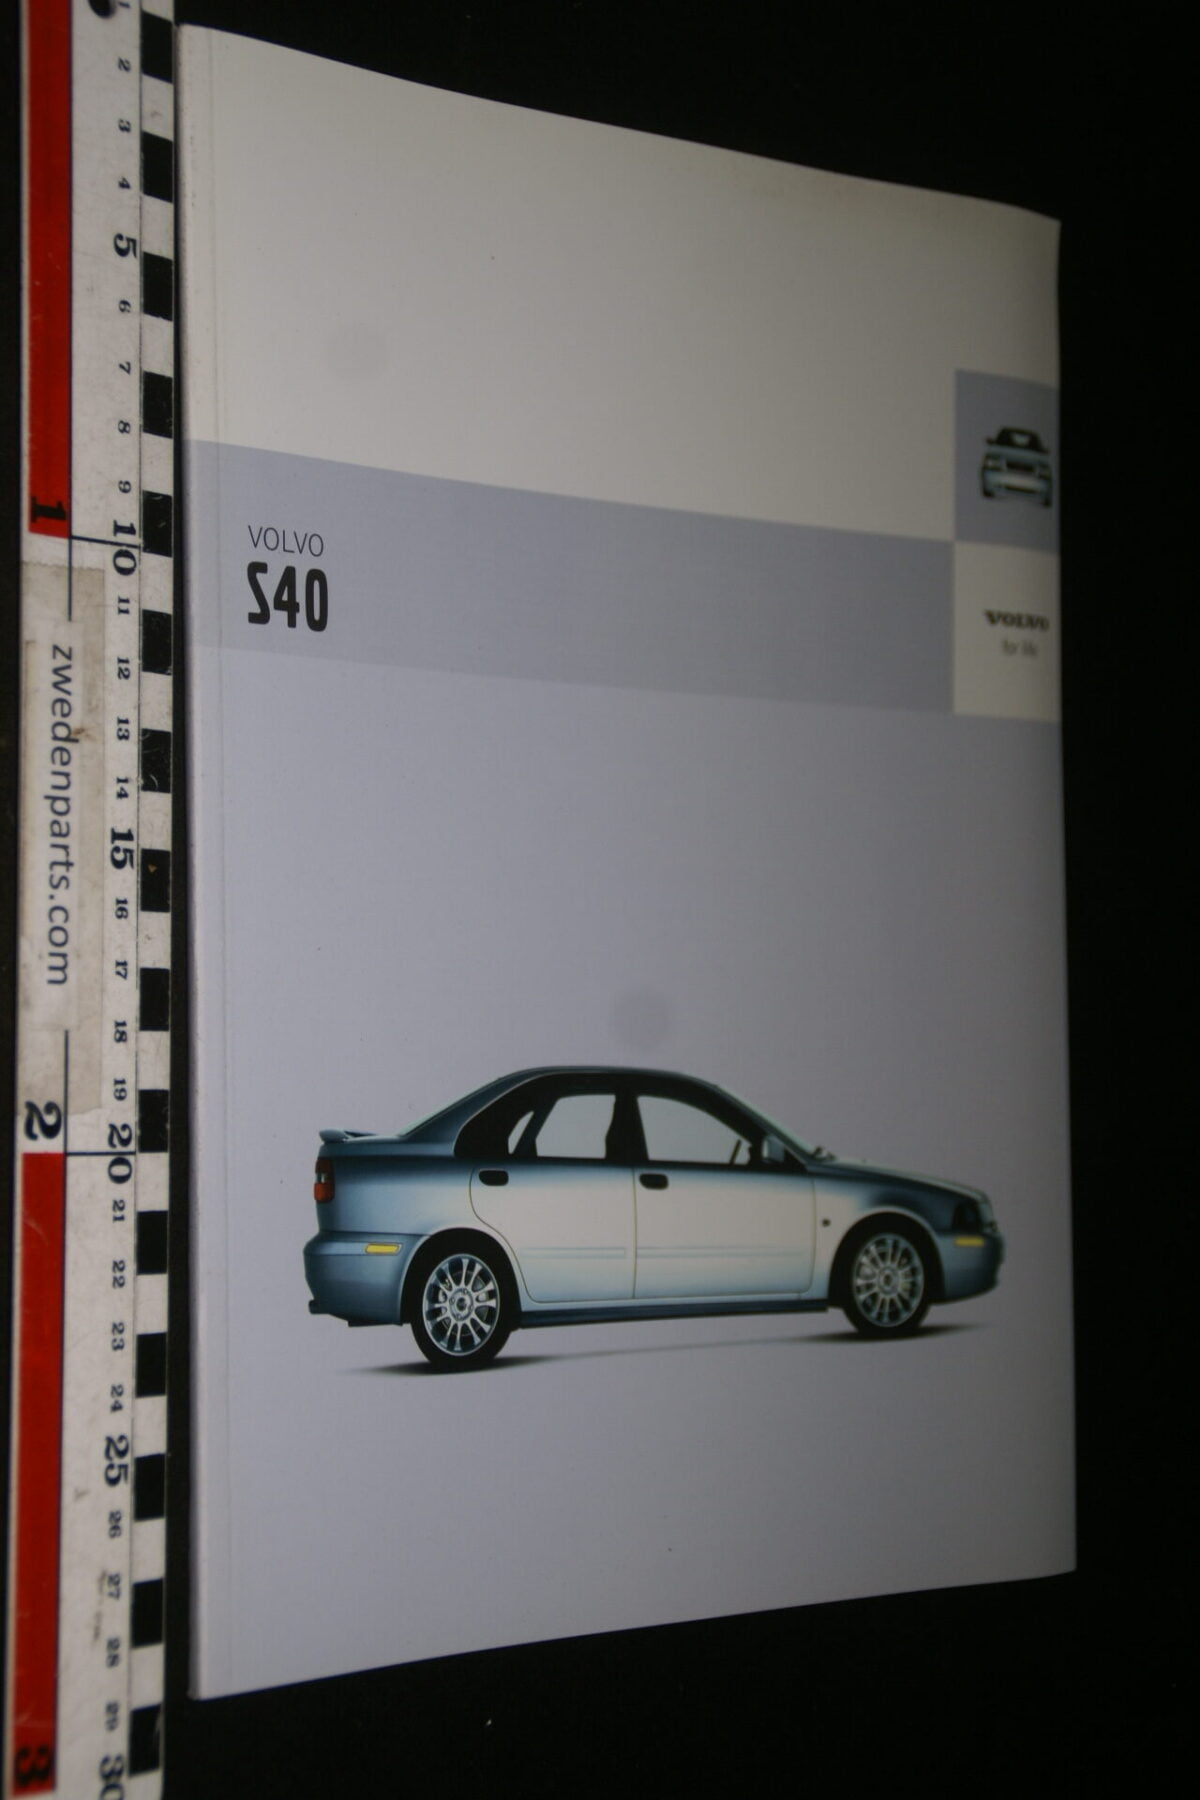 DSC04732 2003 originele brochure Volvo S40 nr MY04 MSPV 527-3698d0d8